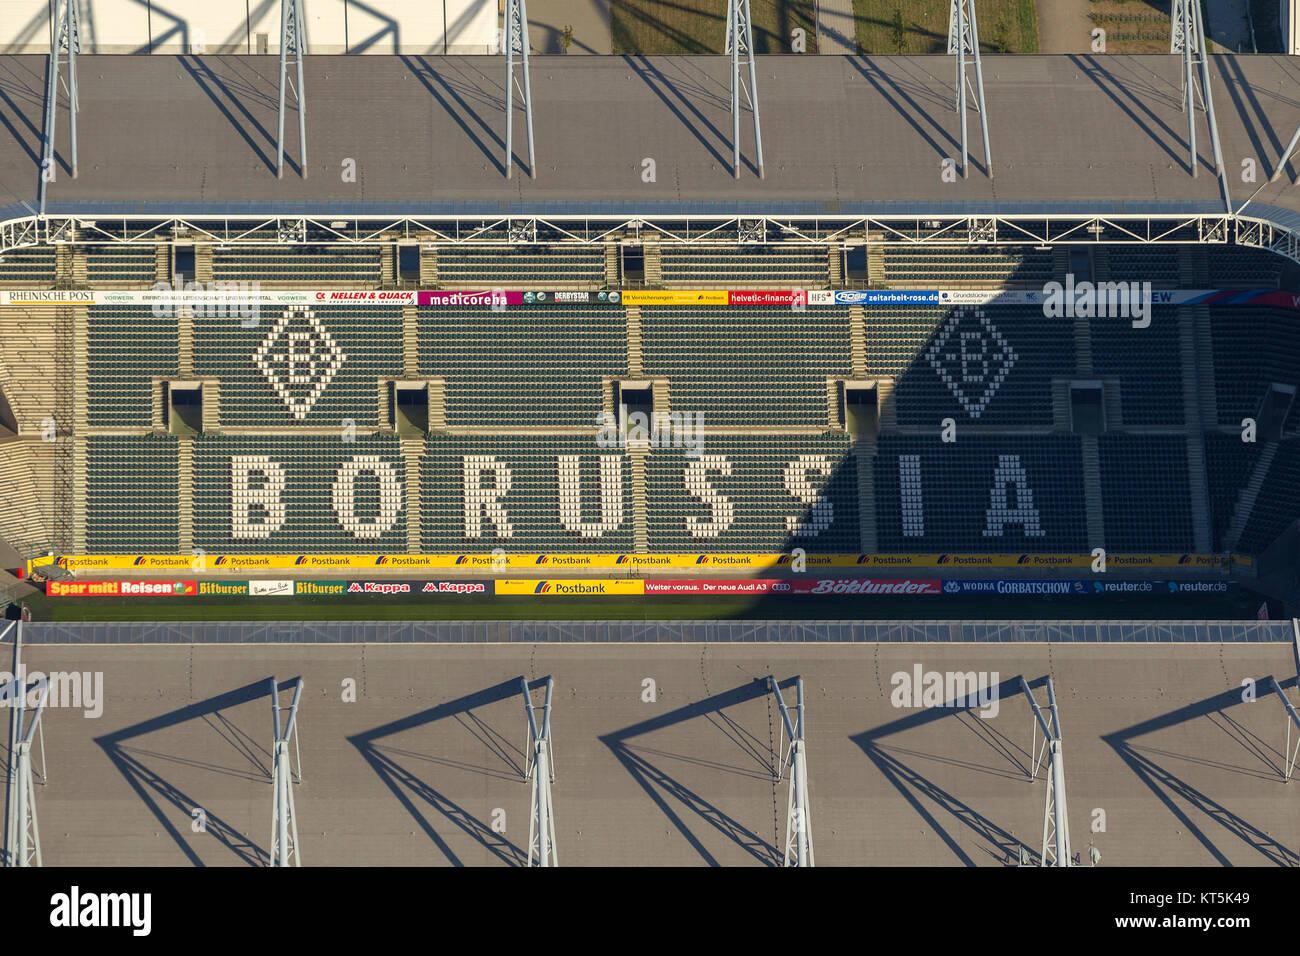 Borussia-Park, the stadium of Borussia Mönchengladbach, Bundesliga football, Moenchengladbach, Lower Rhine, - Stock Image